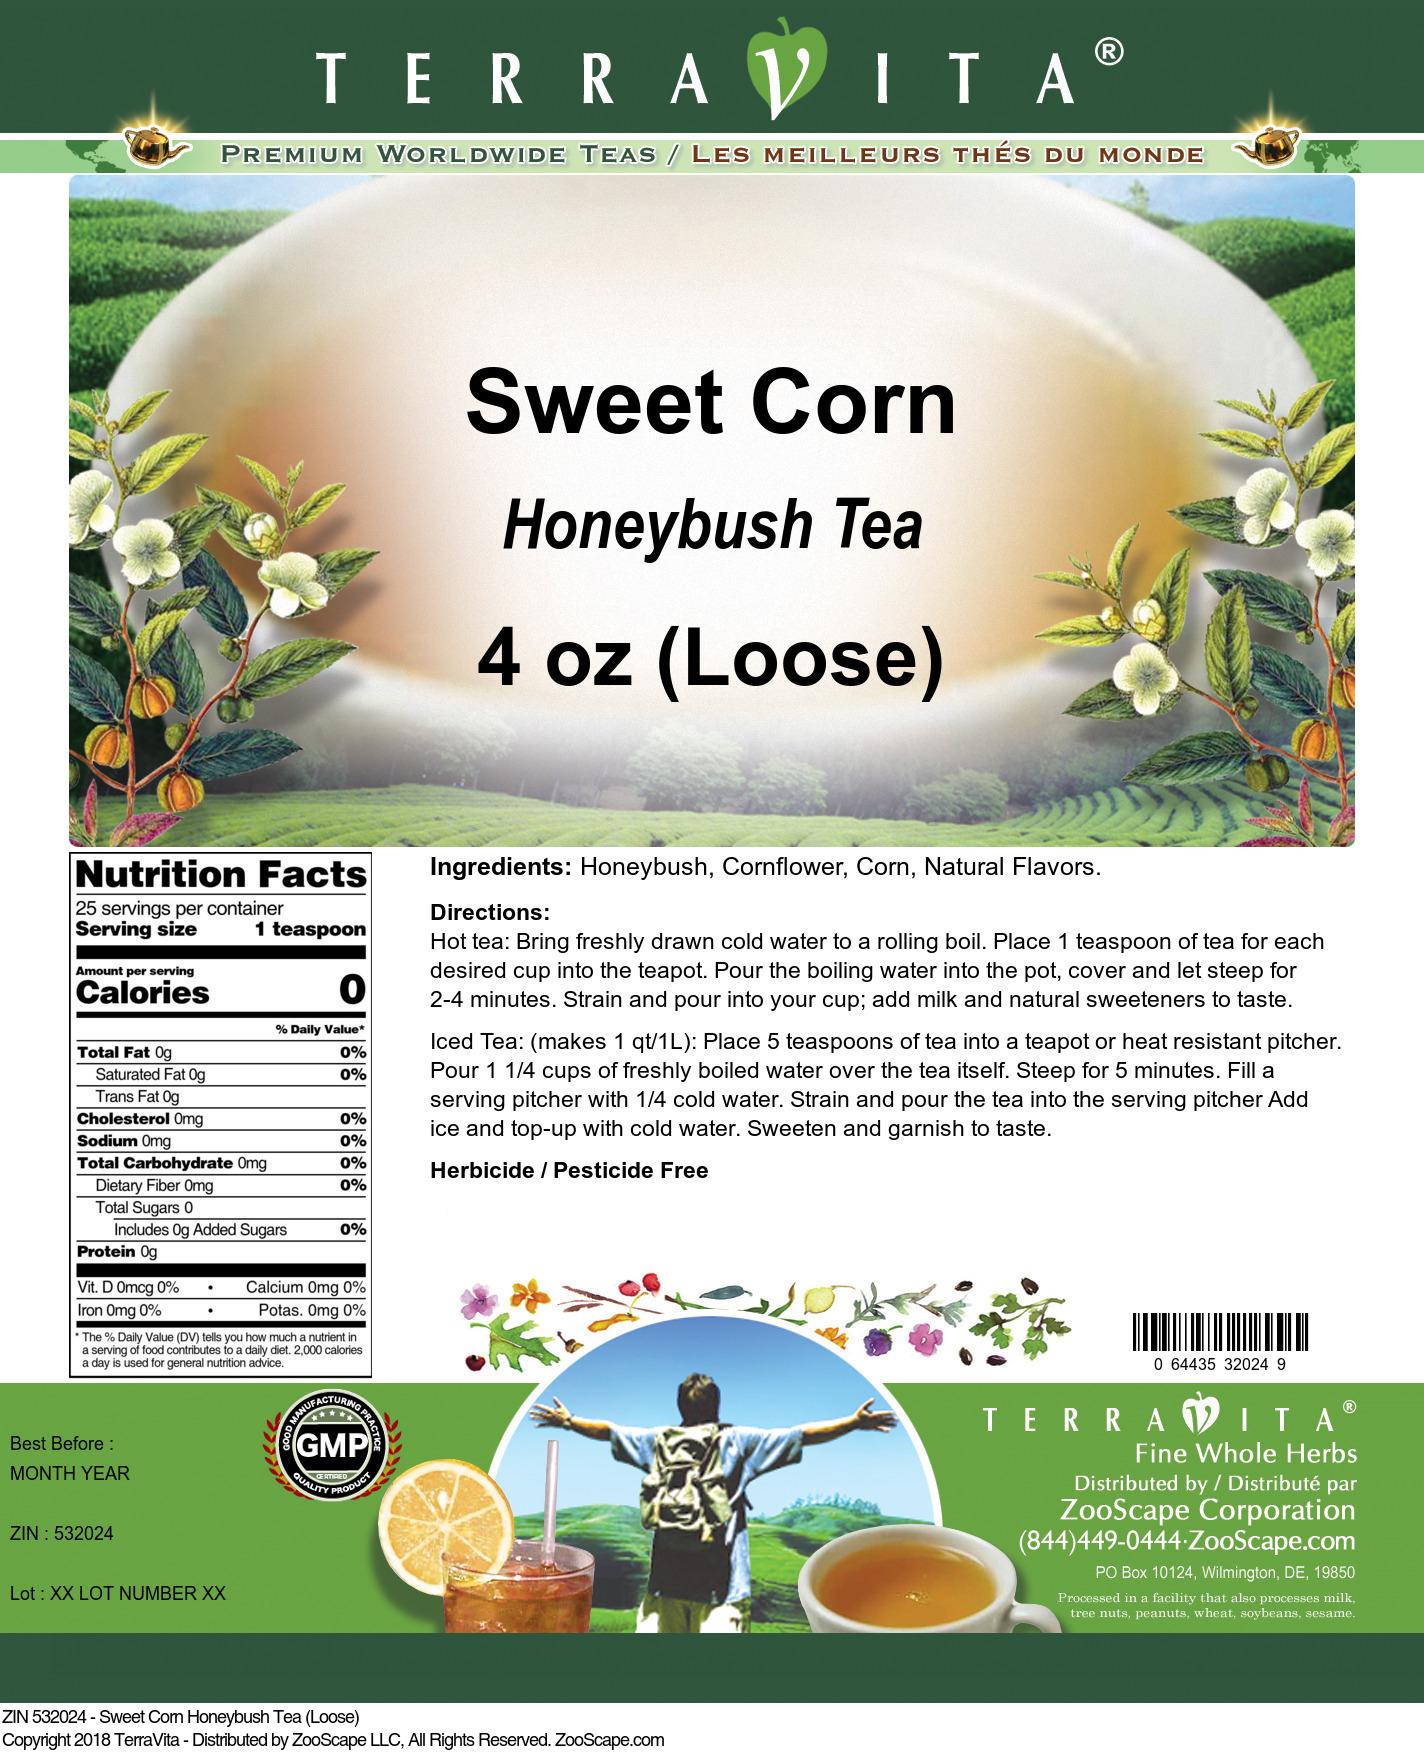 Sweet Corn Honeybush Tea (Loose)